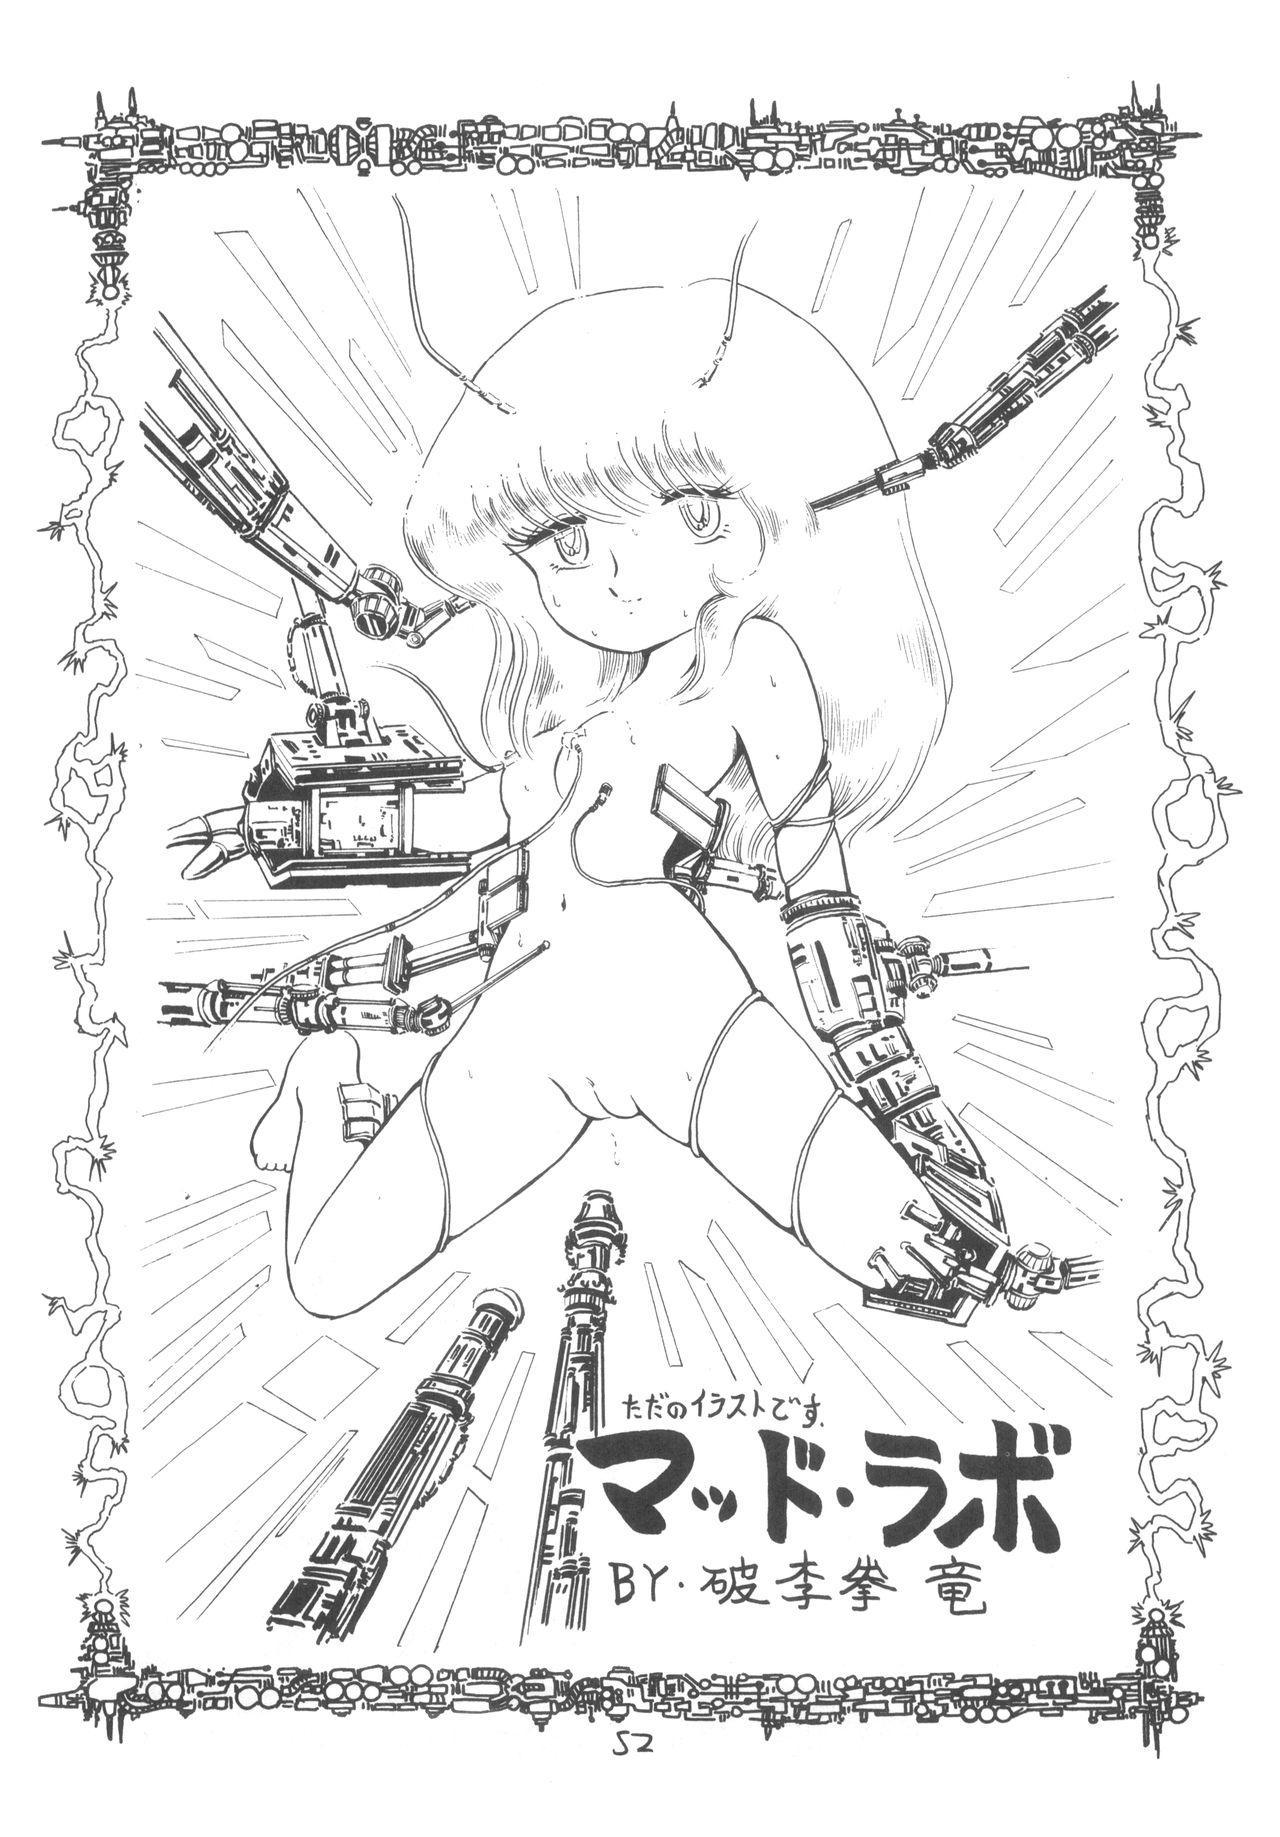 TEKUNO RORIA 53